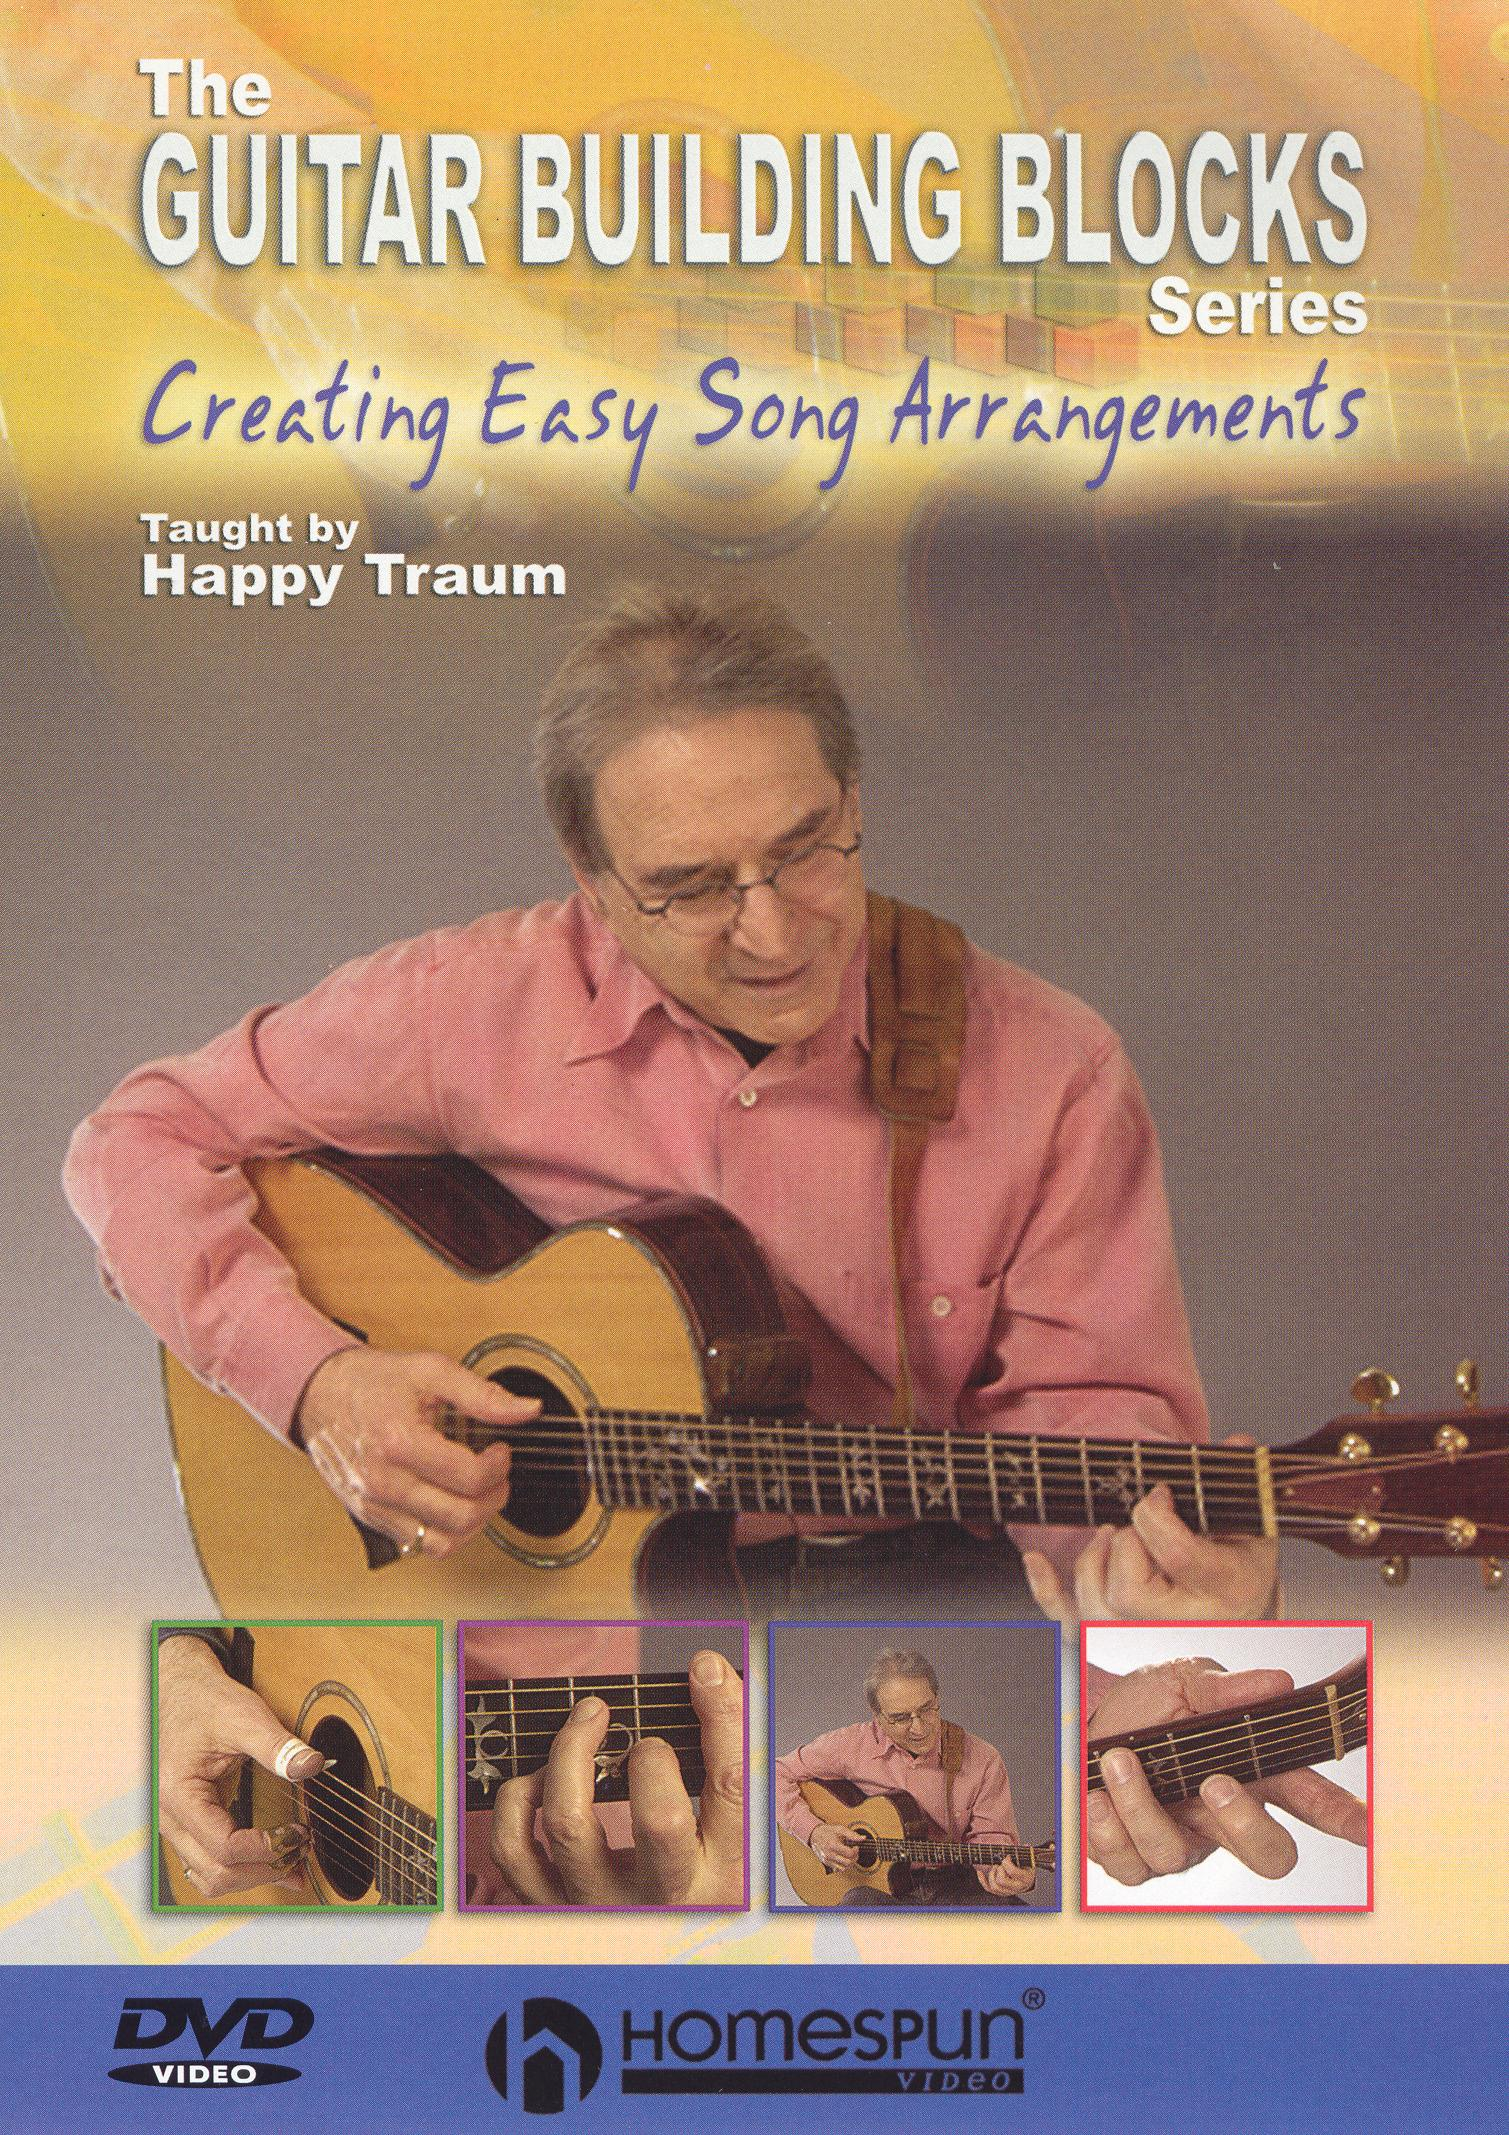 Happy Traum: Creating Easy Song Arrangements